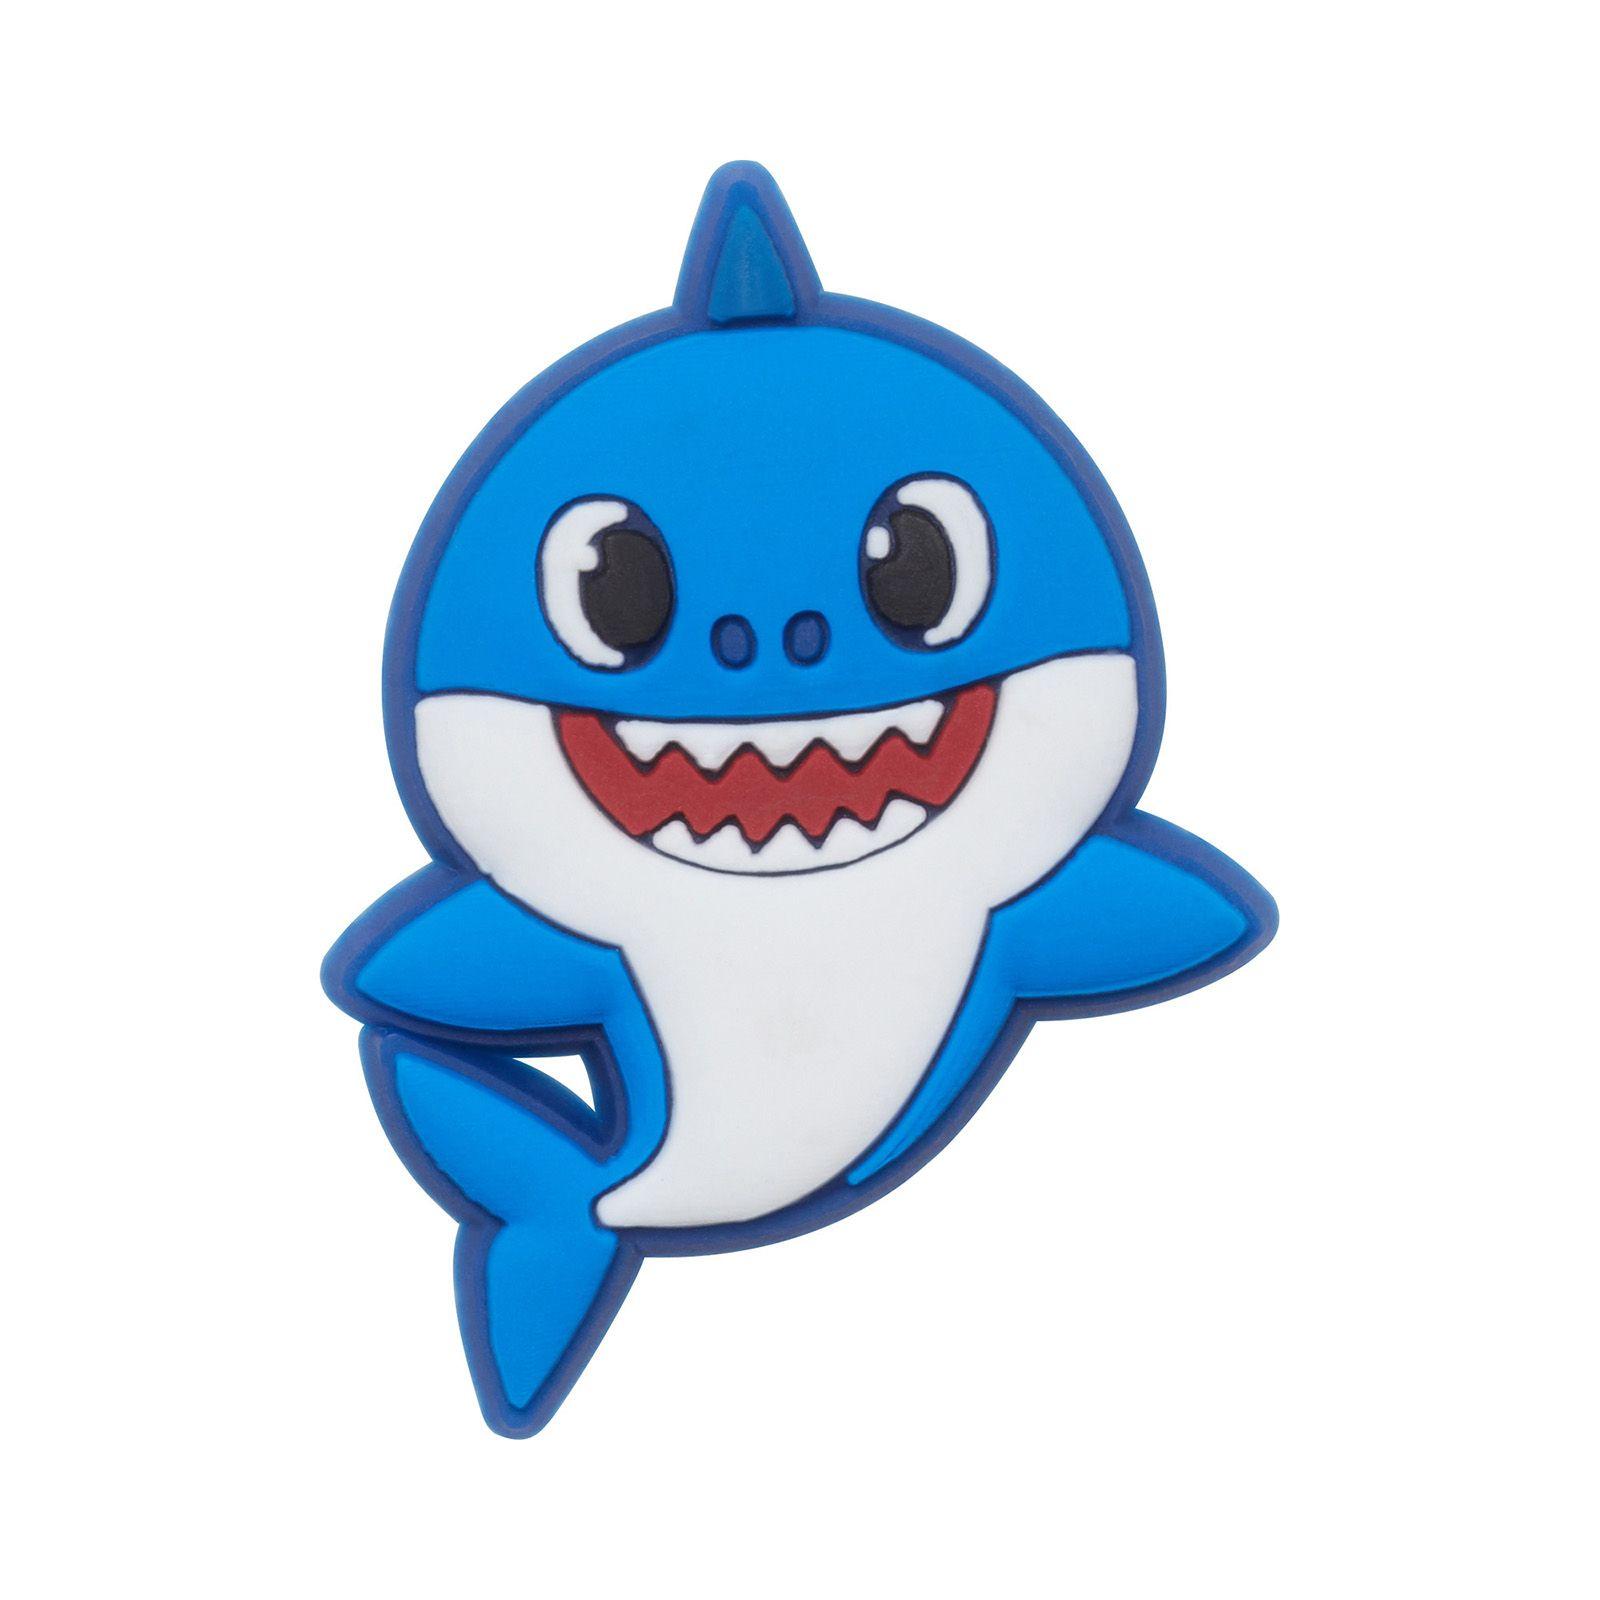 Jibbitz Crocs Daddy Shark